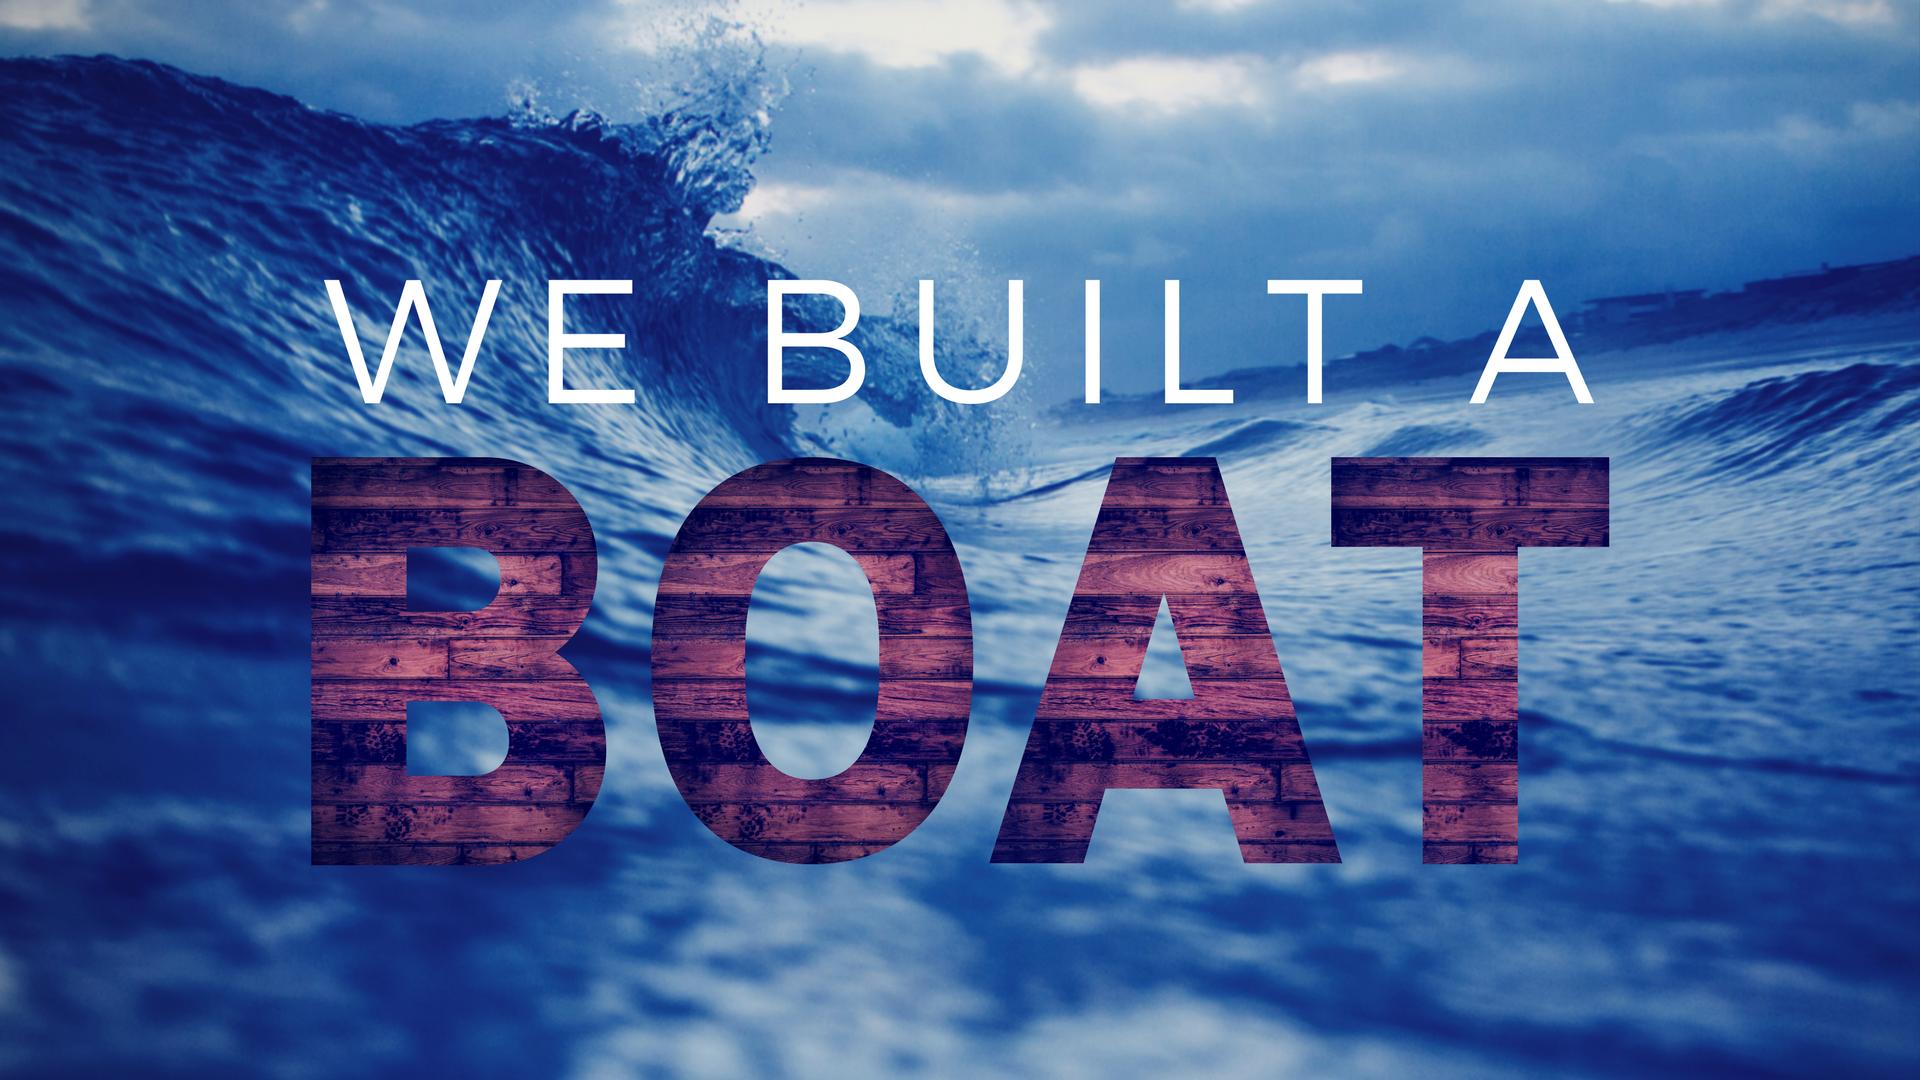 We Built A Boat FINAL.png